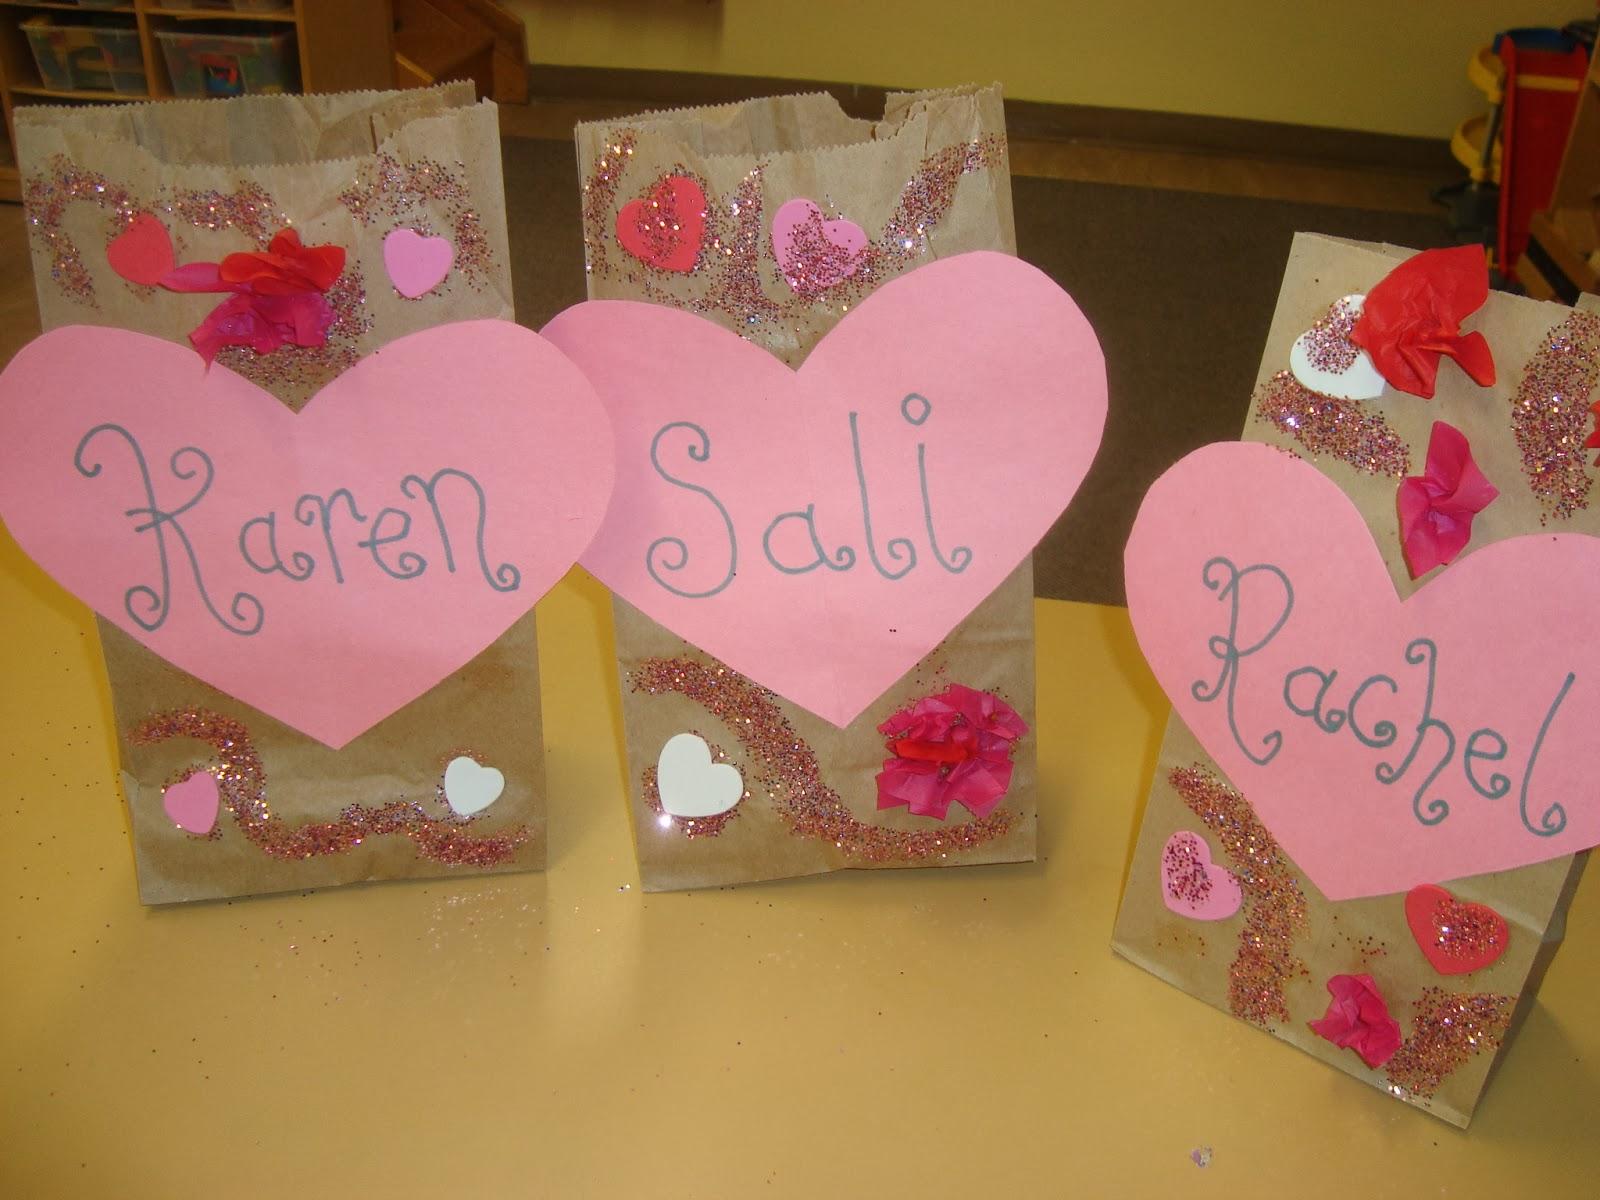 St. Catherine\'s Preschool: A Sweet Month at Preschool, February 2014